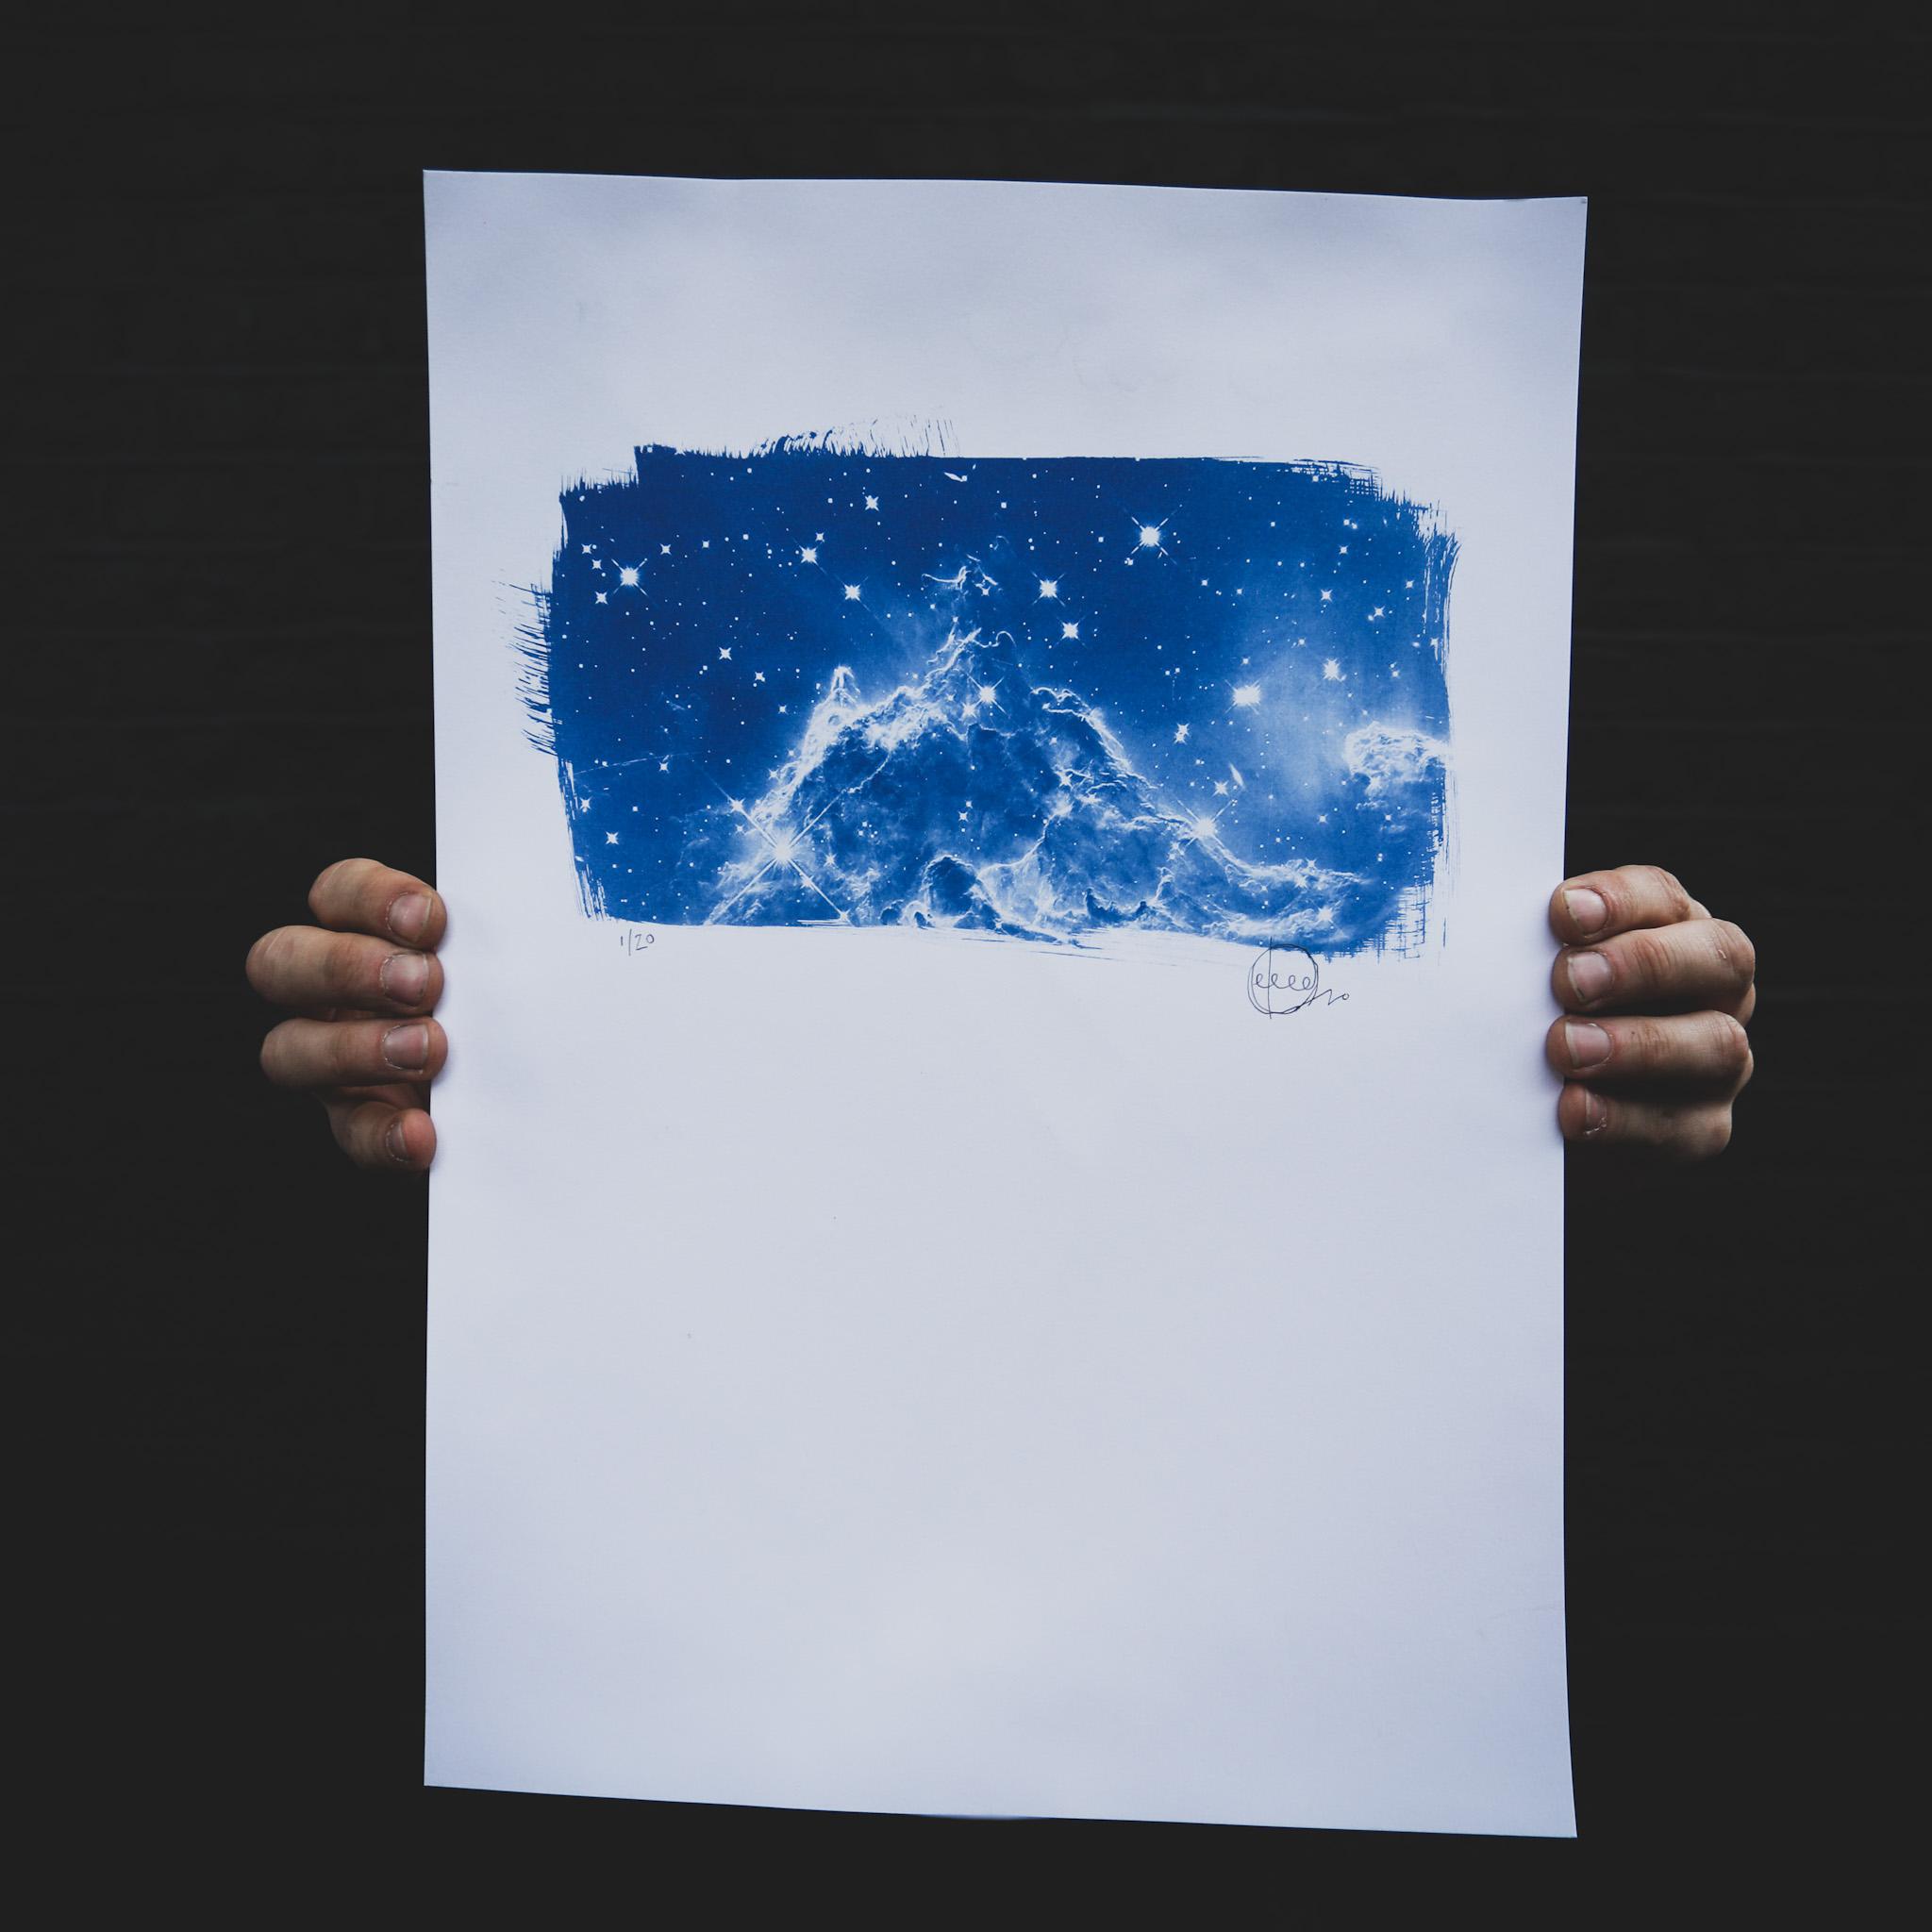 99080825 3062 4284 B922 E19DD06D36C7 - Monkey Head Nebula by Craig Keenan